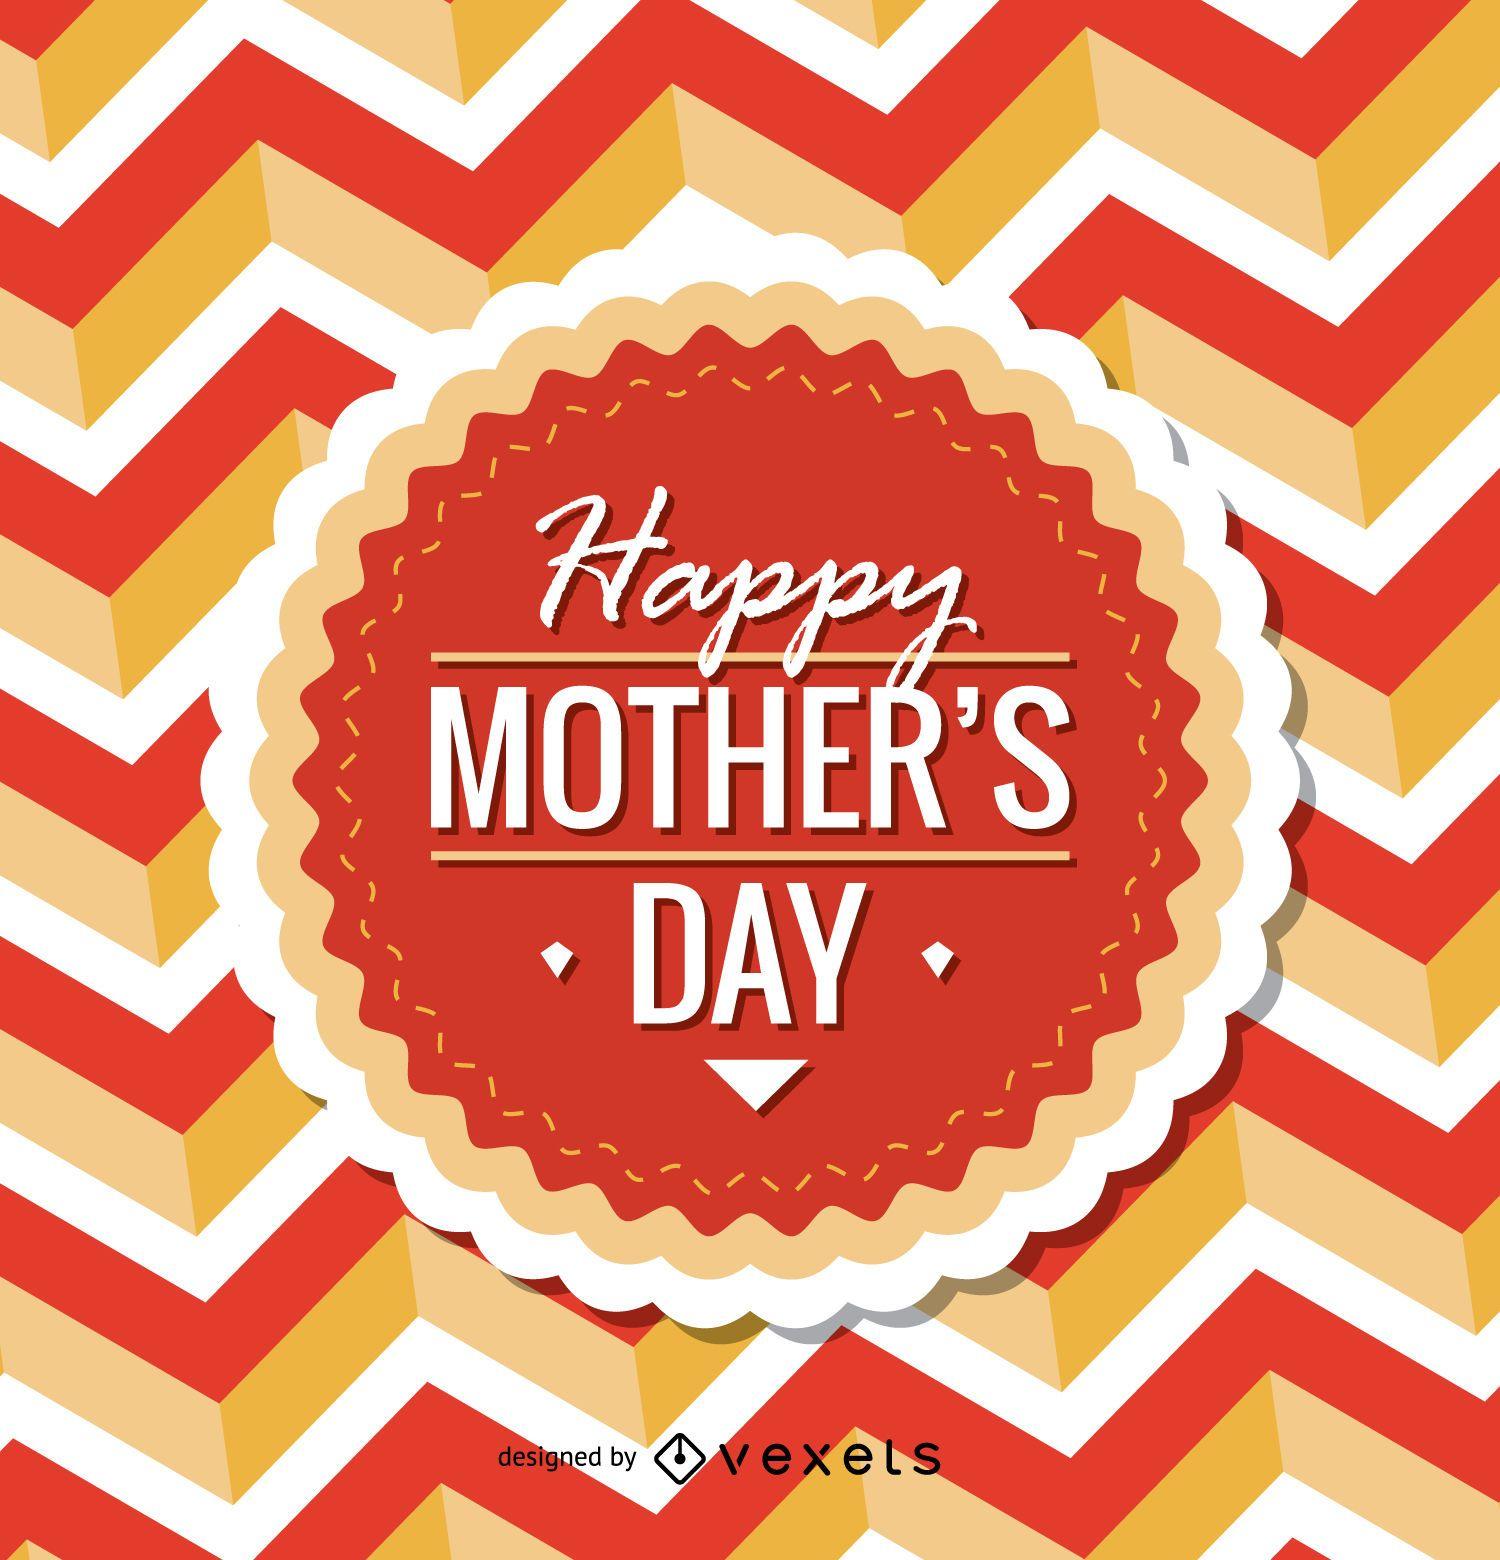 Circular Happy Mother's Day emblem